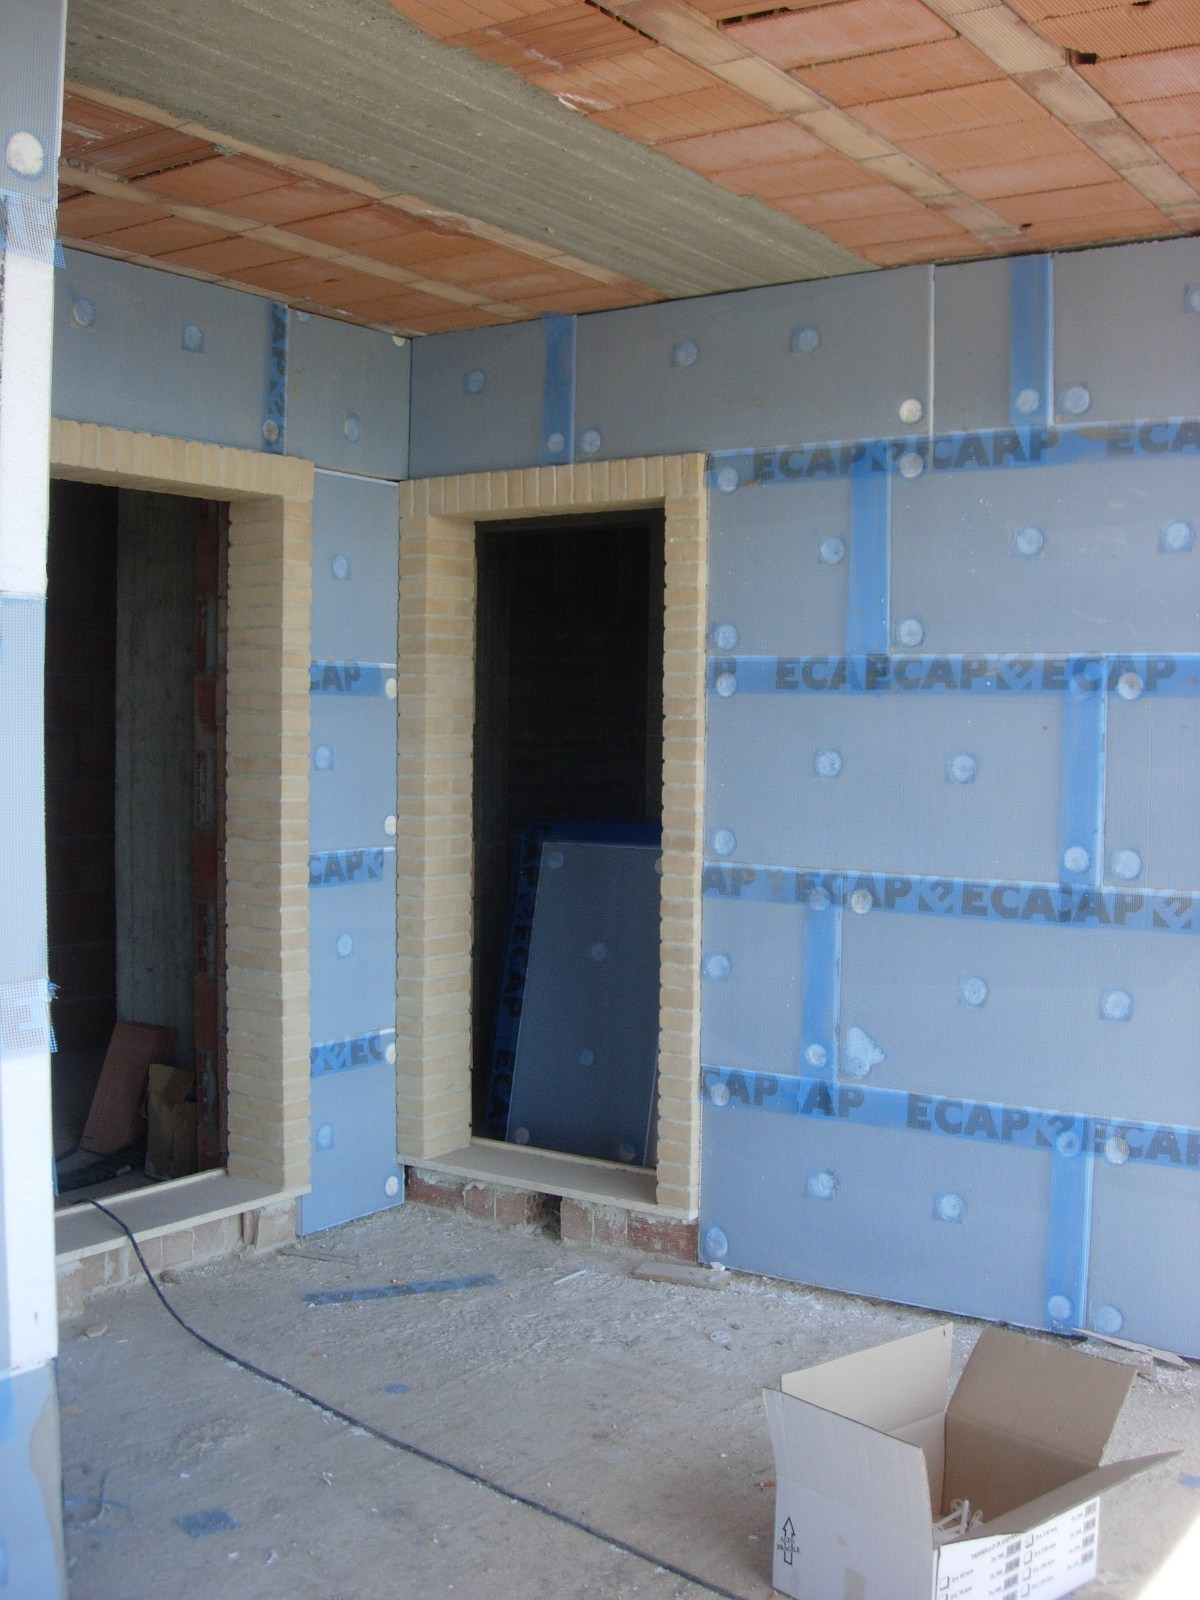 panneau thermo isolant en polyur thane expans ecap gt by edilteco. Black Bedroom Furniture Sets. Home Design Ideas